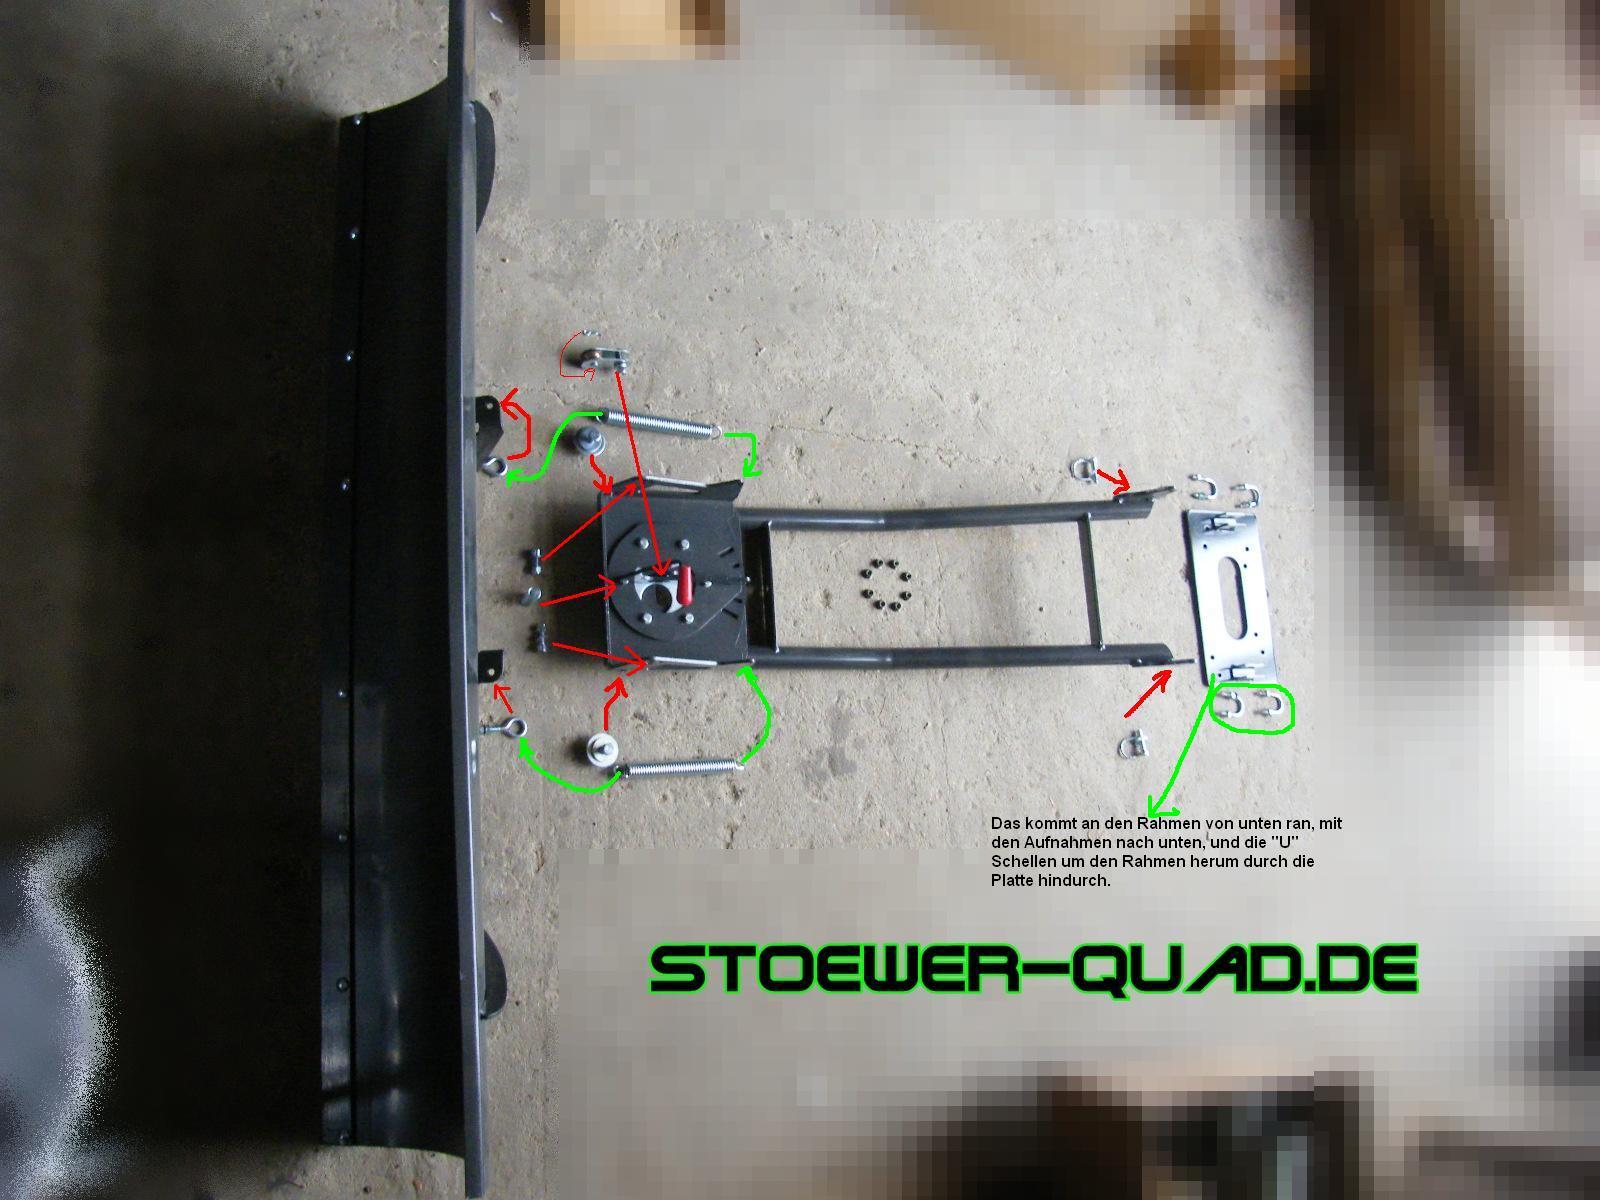 http://quad-schneeschild.quadundmotorrad.de/Teile-008-schneeschild-ATV-700-Einbau.JPG